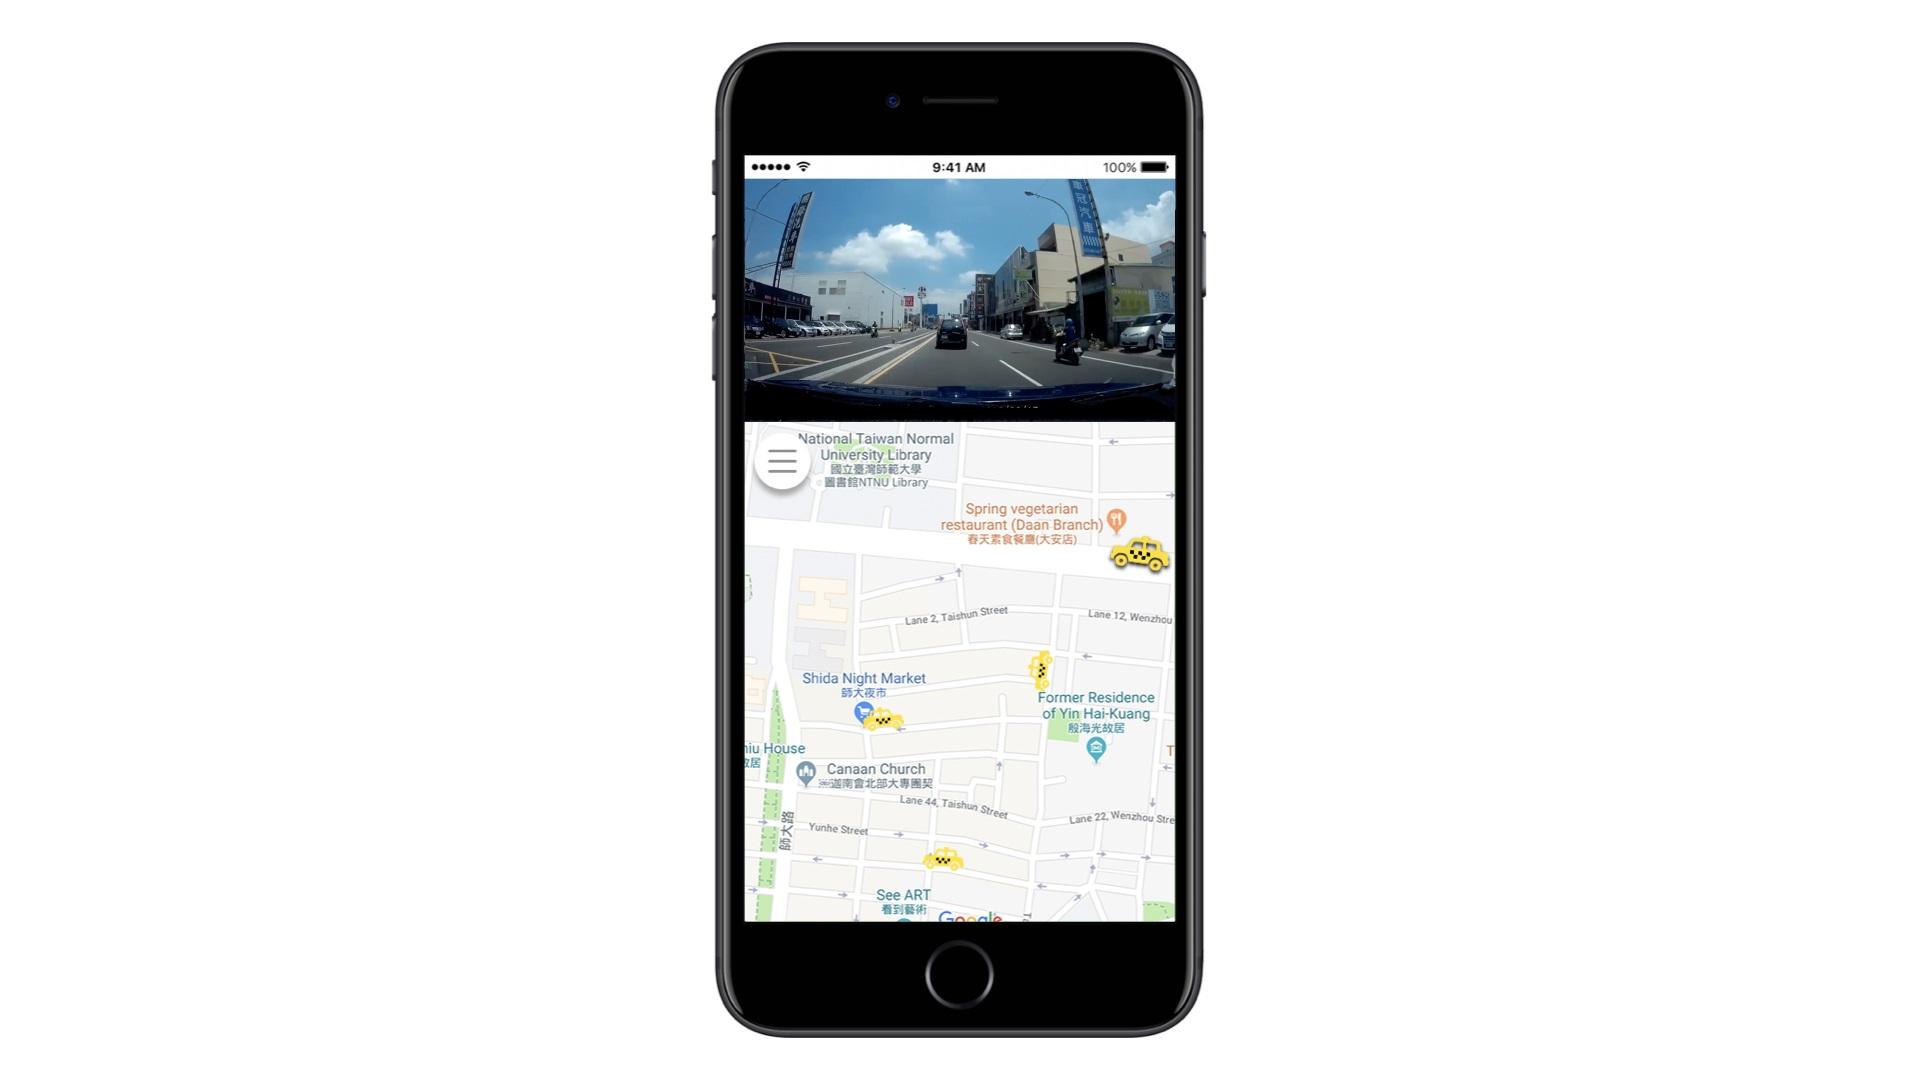 OmniEyes - Next-Generation Mobile Video Platform